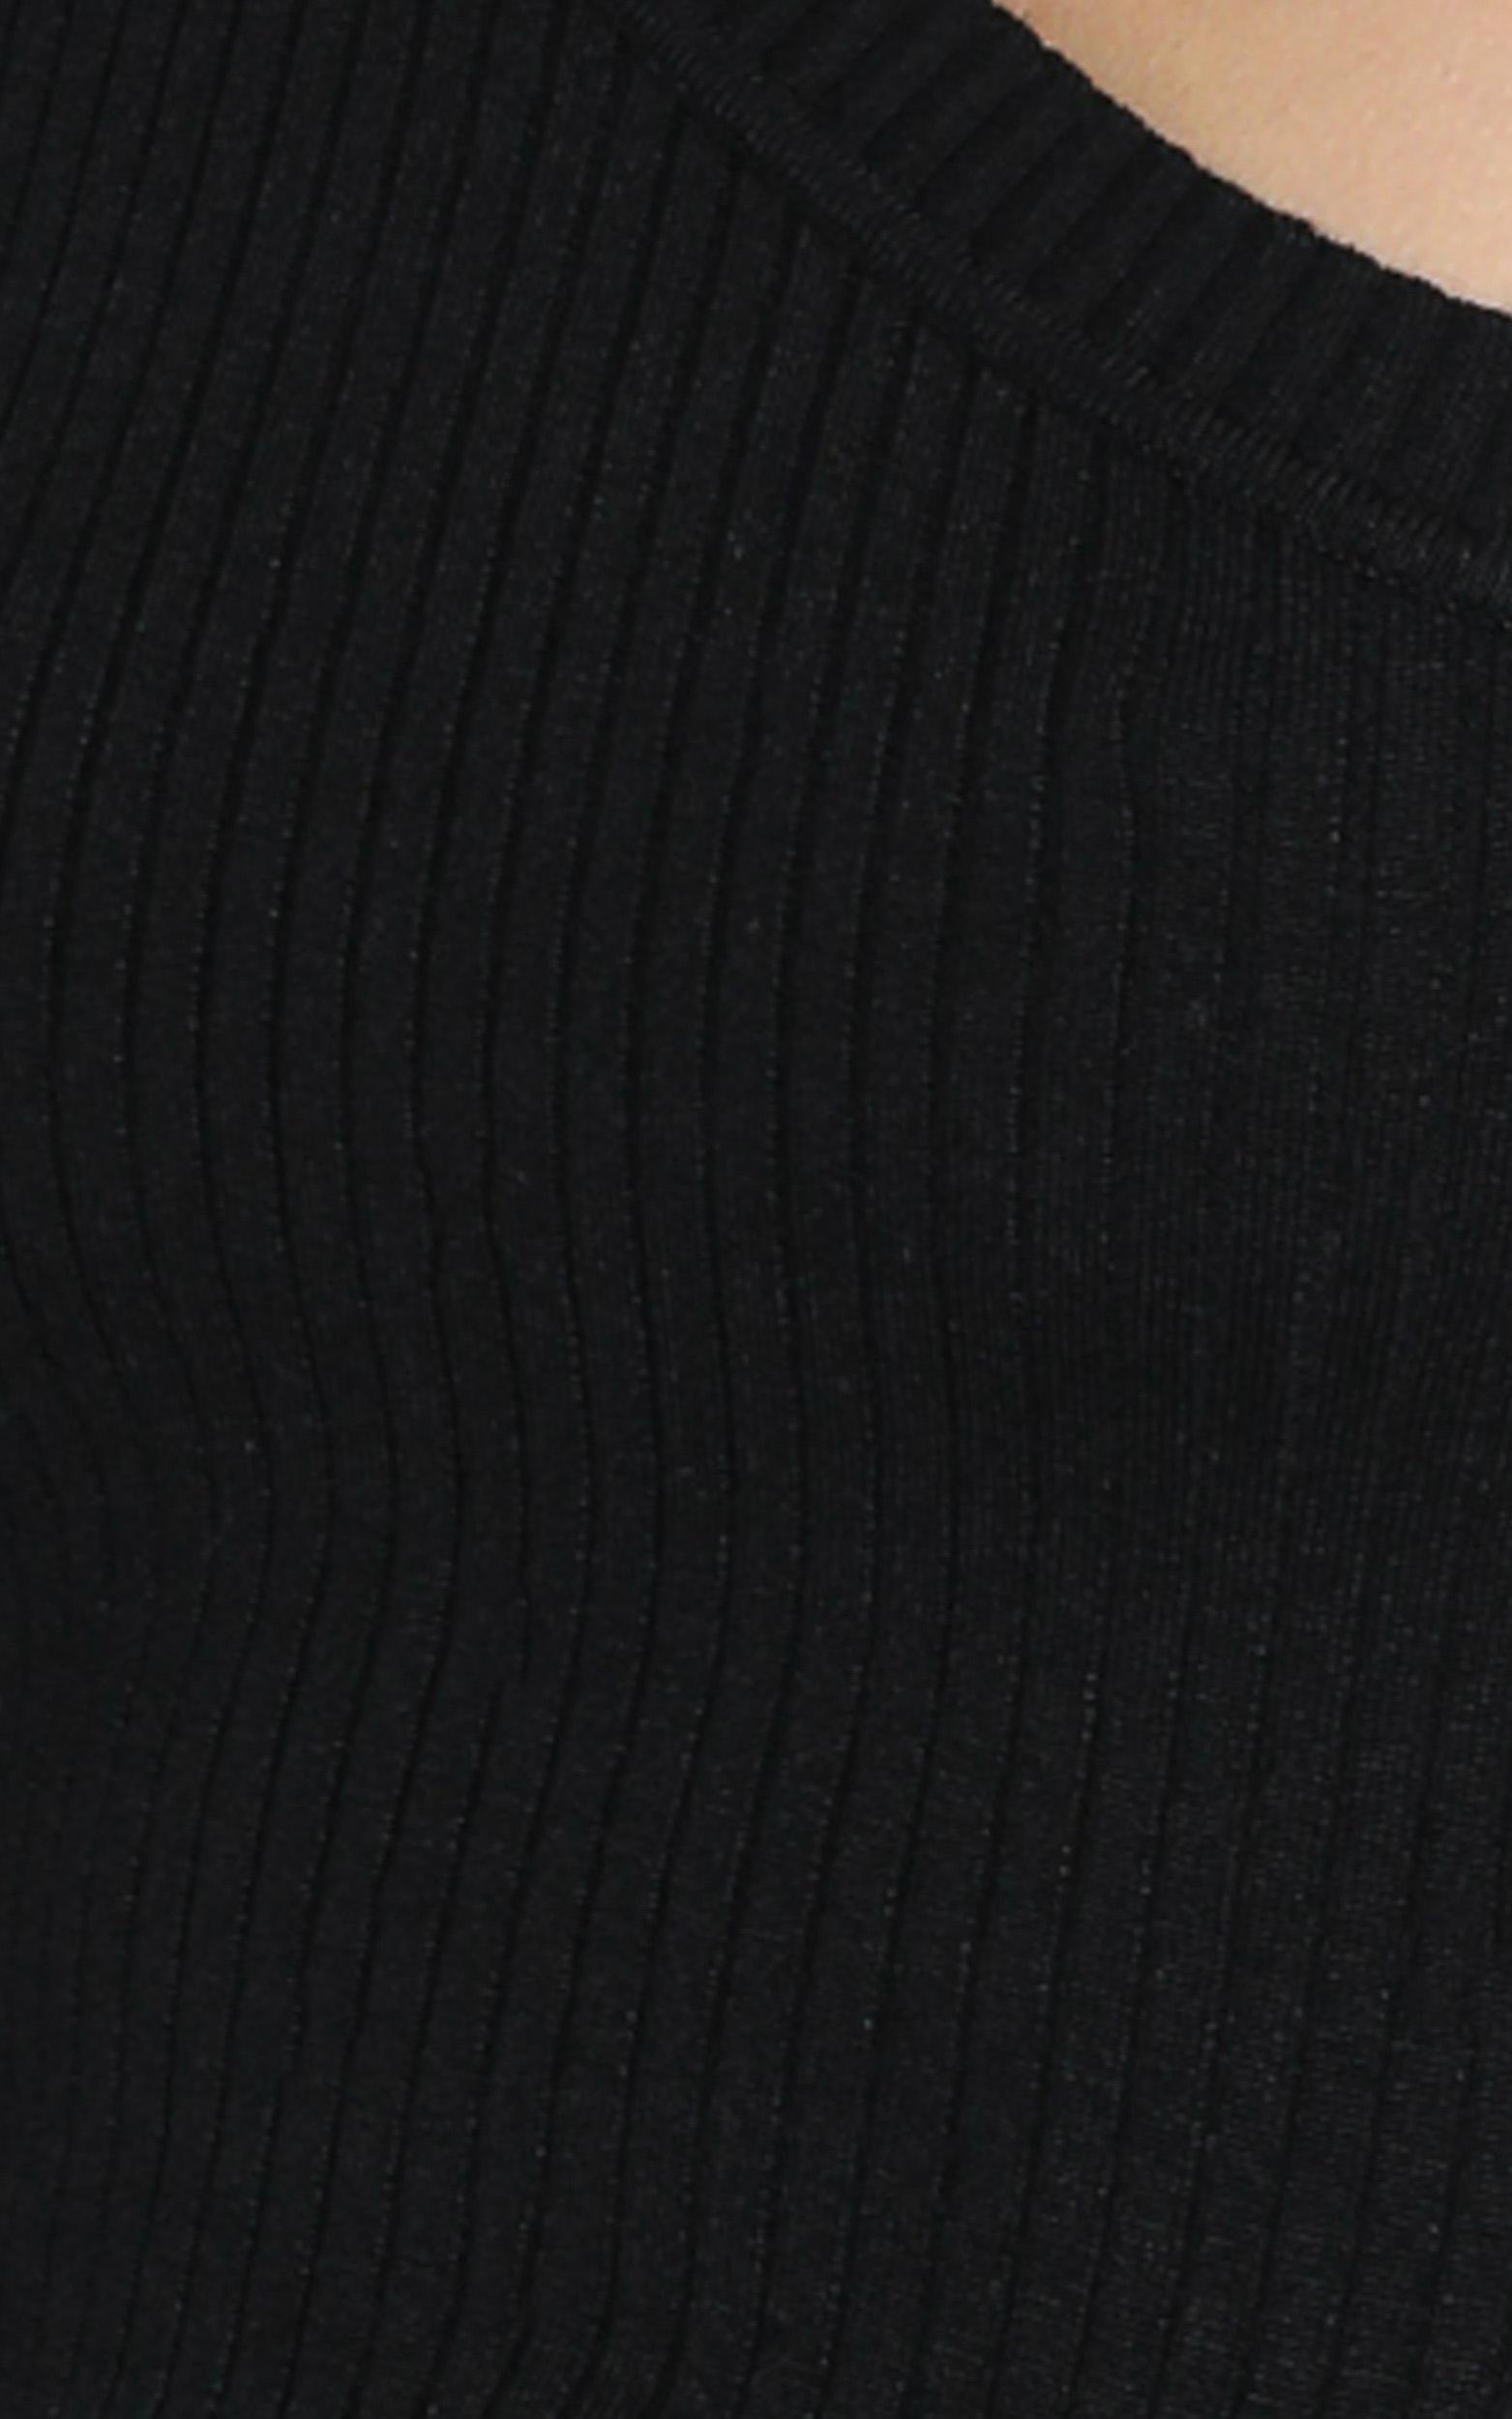 Larisa Asymetric Knit Top in Black - S, Black, hi-res image number null